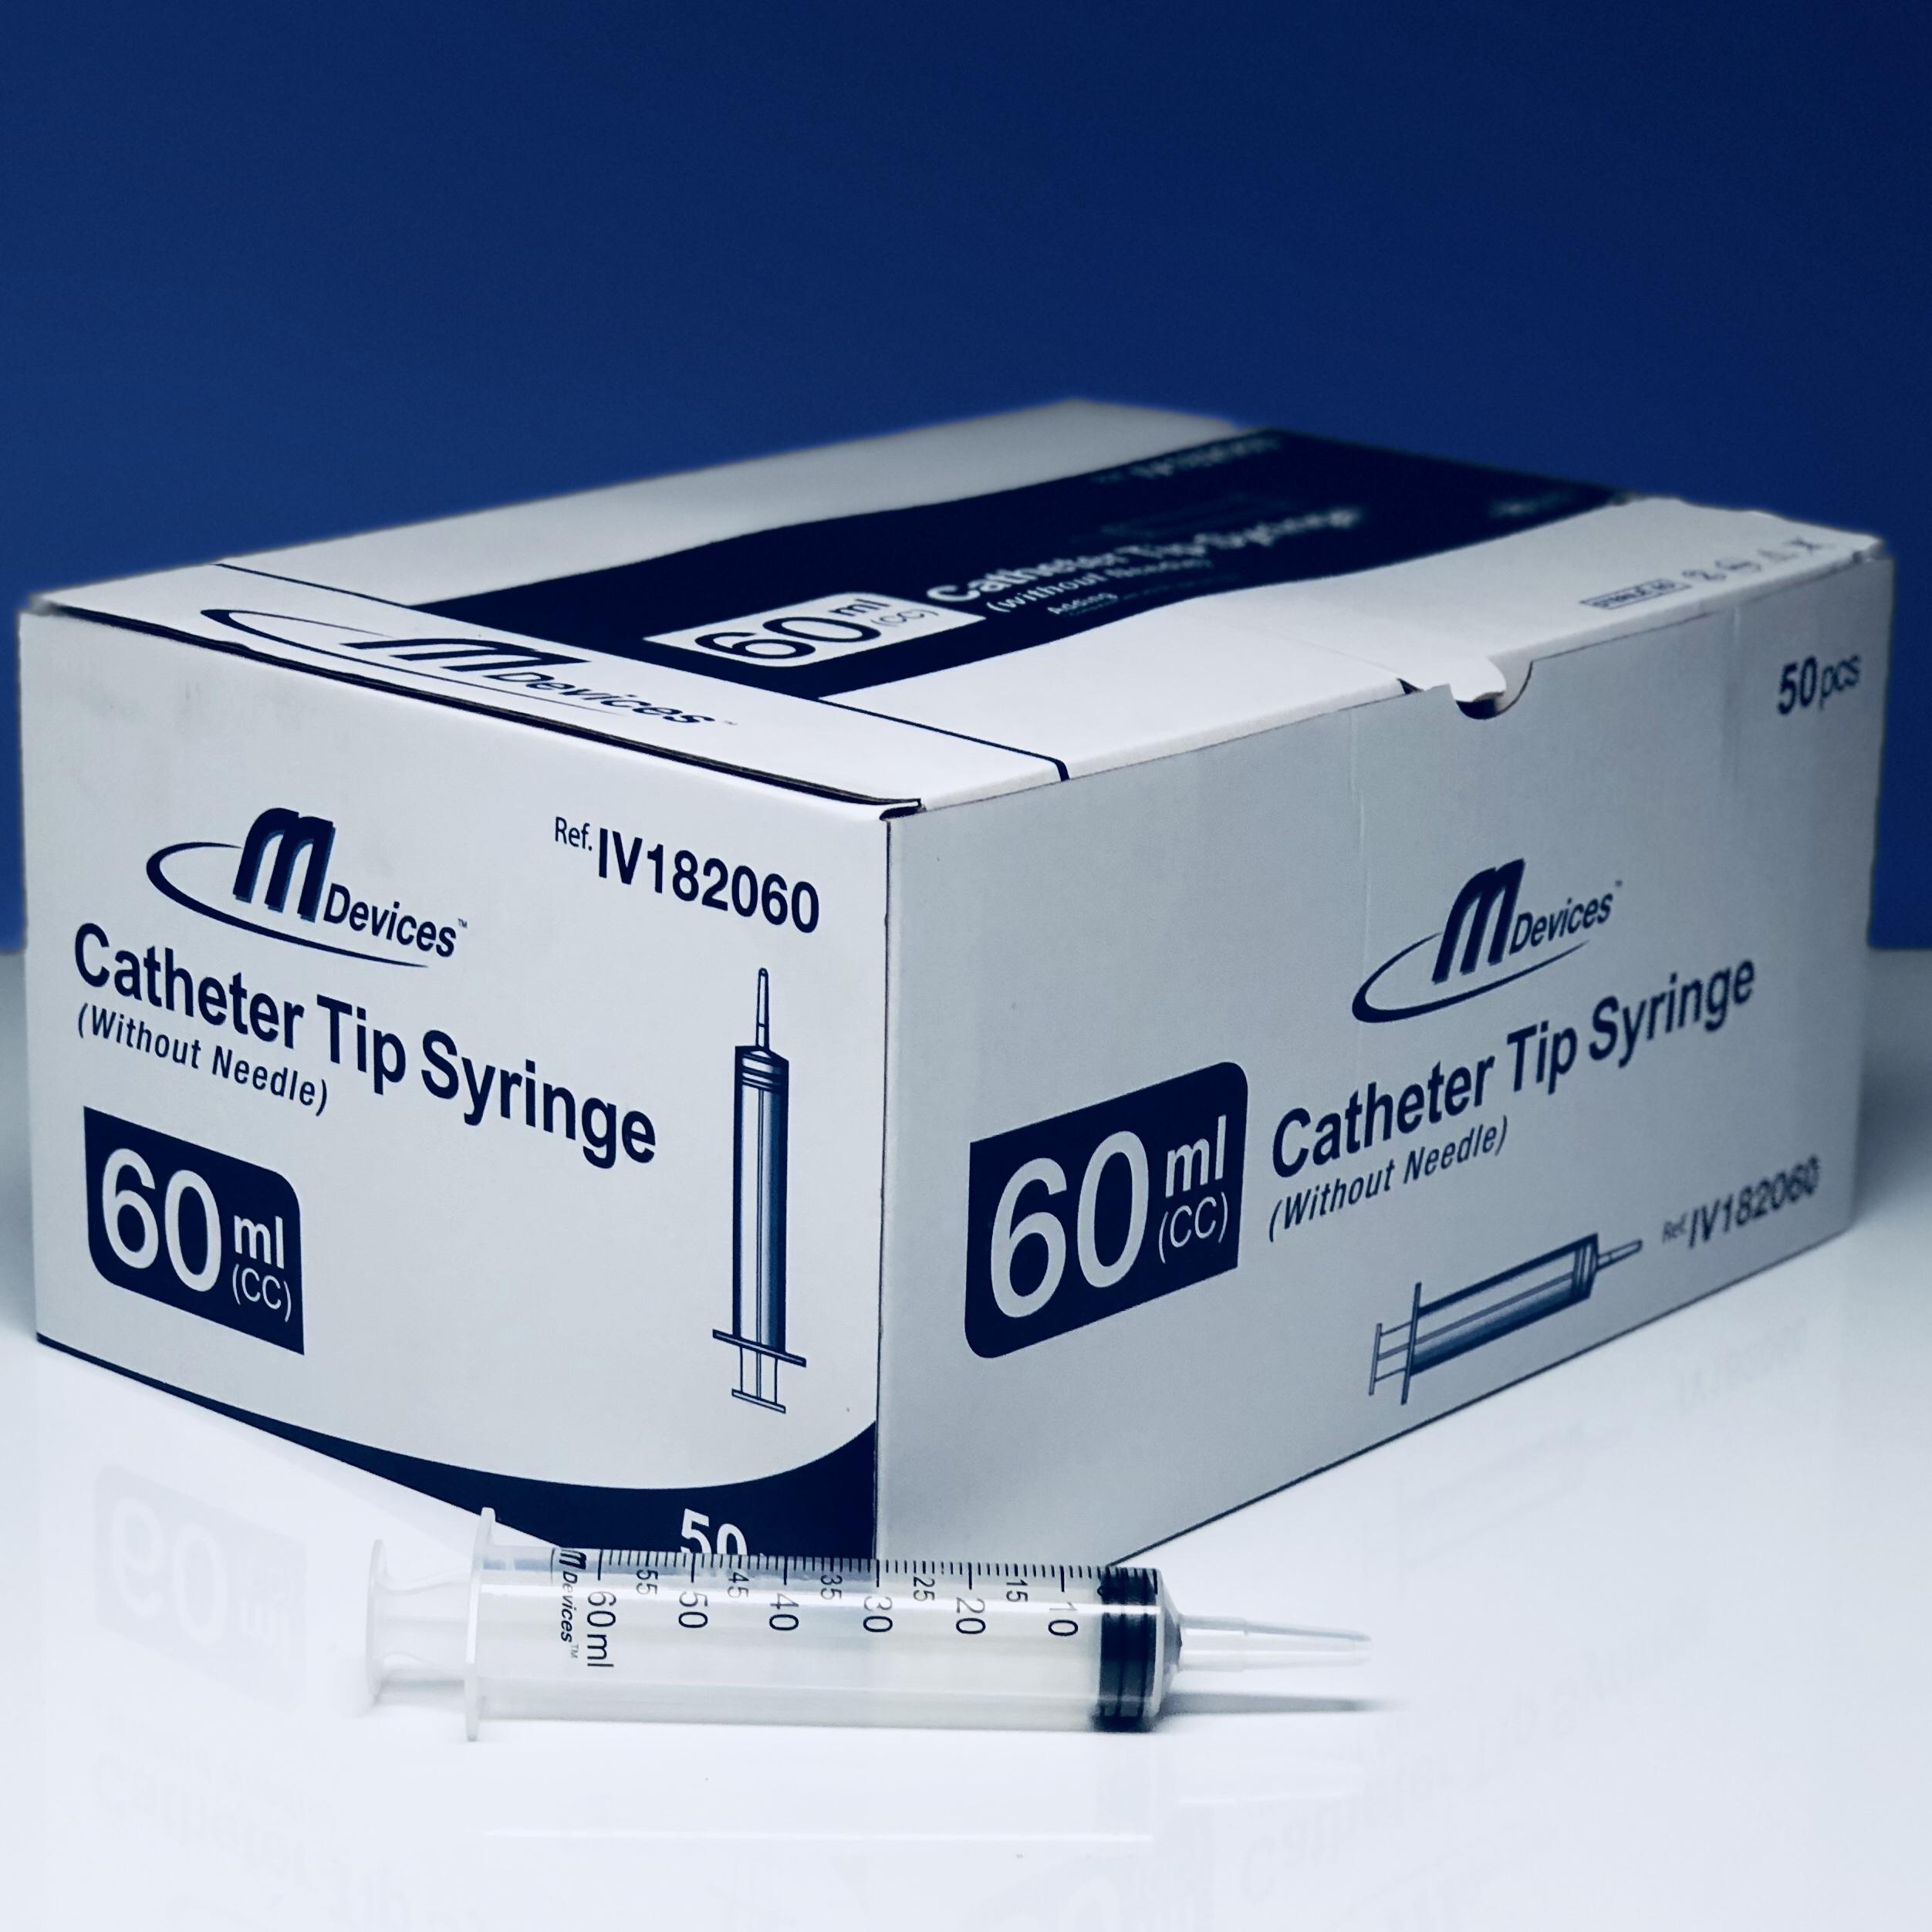 M DEVICES SYRINGE 60ML CATHETER TIP BOX 50